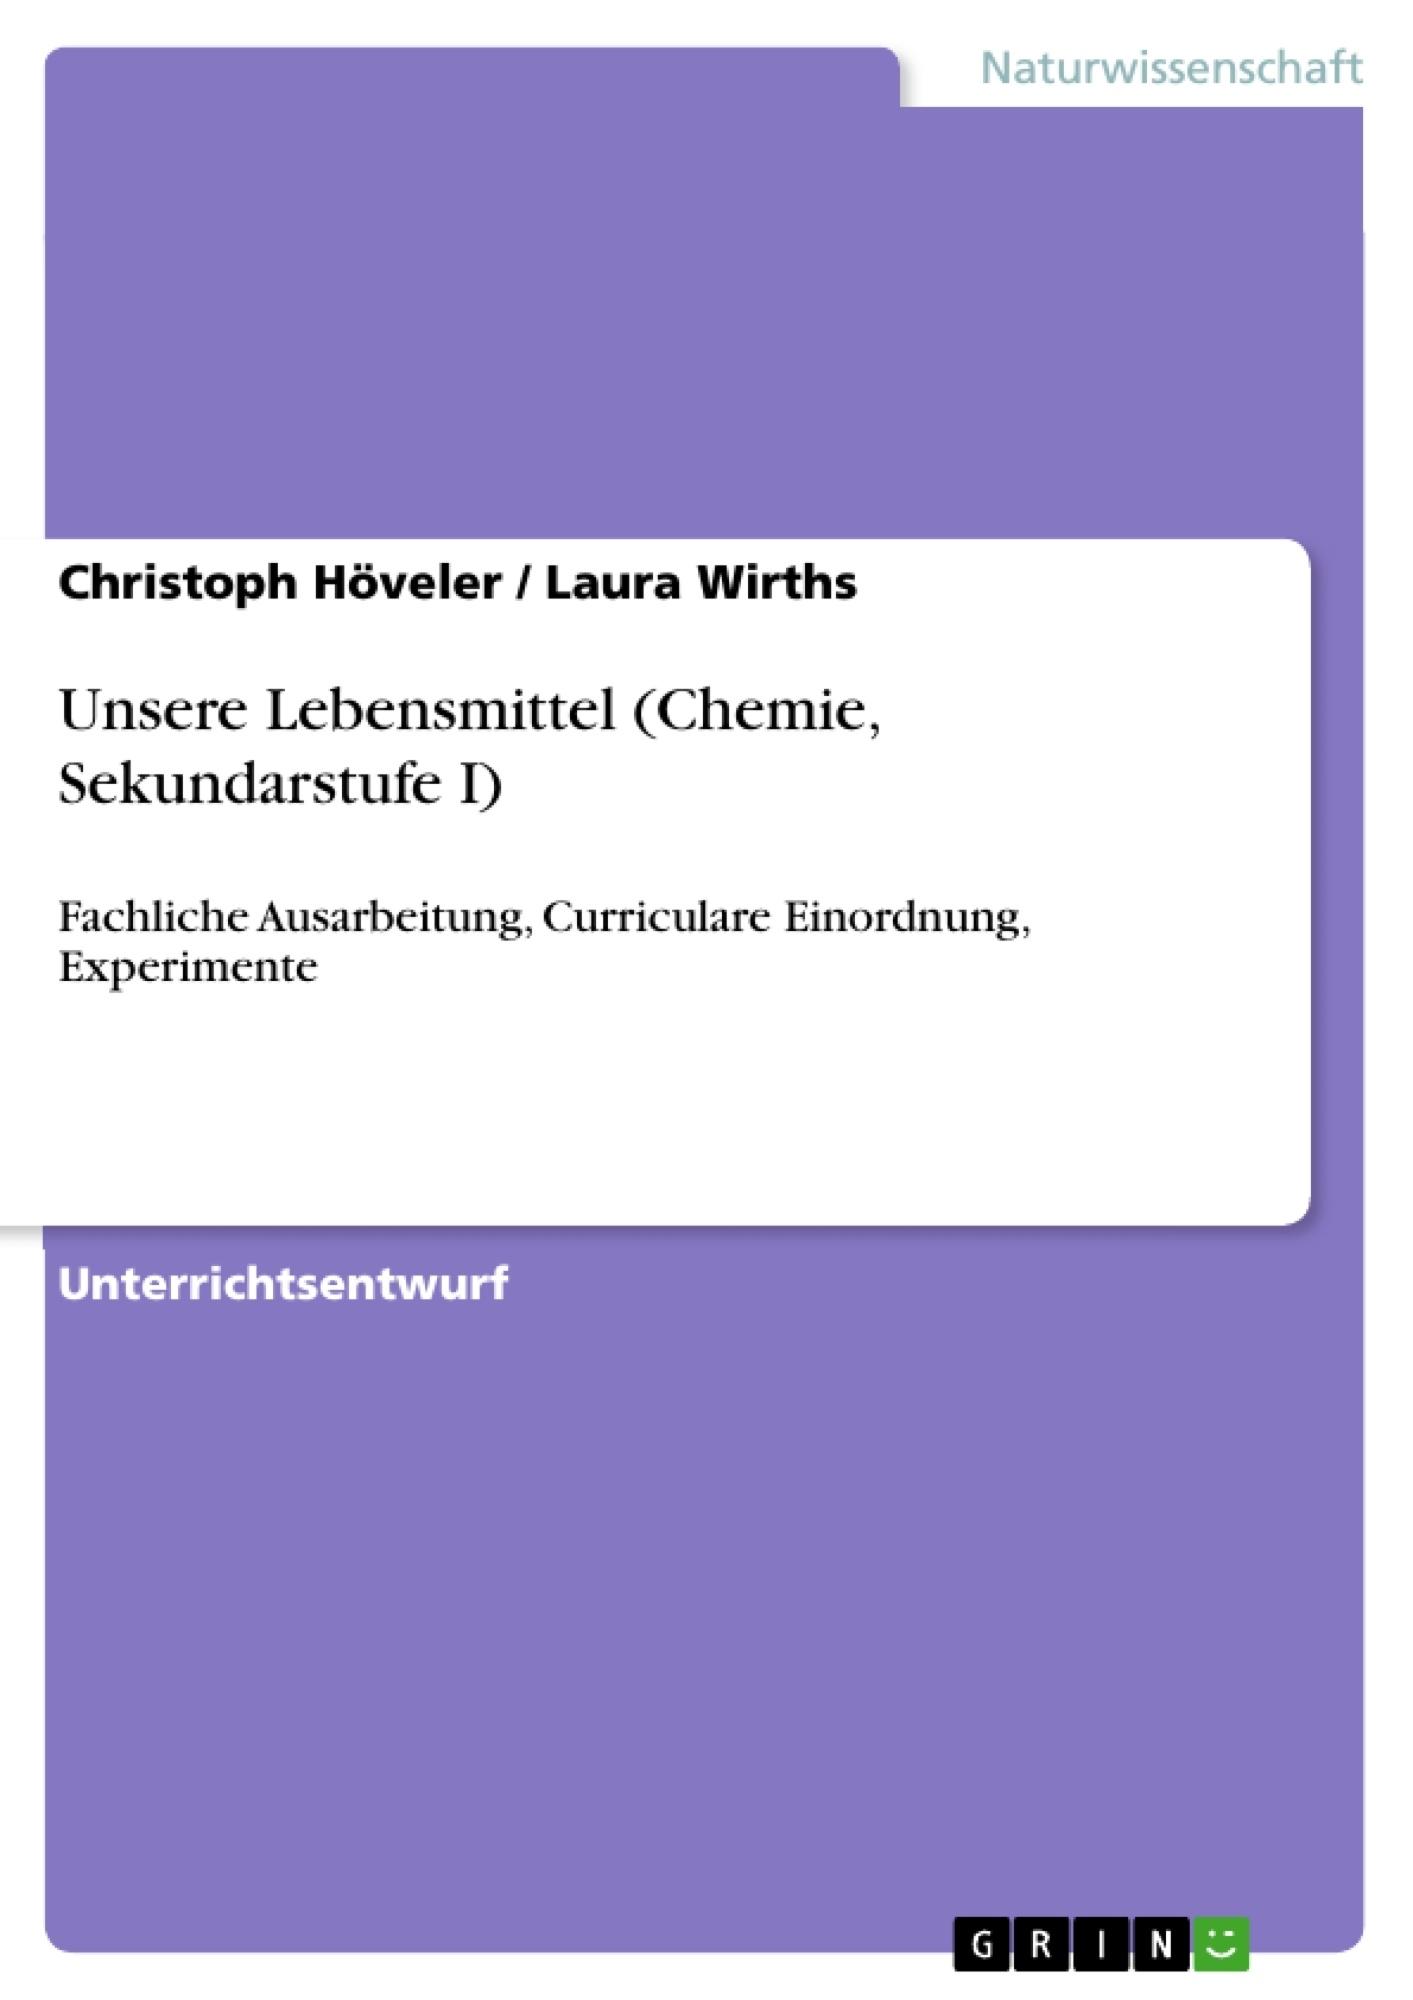 Unsere Lebensmittel (Chemie, Sekundarstufe I) | Masterarbeit ...